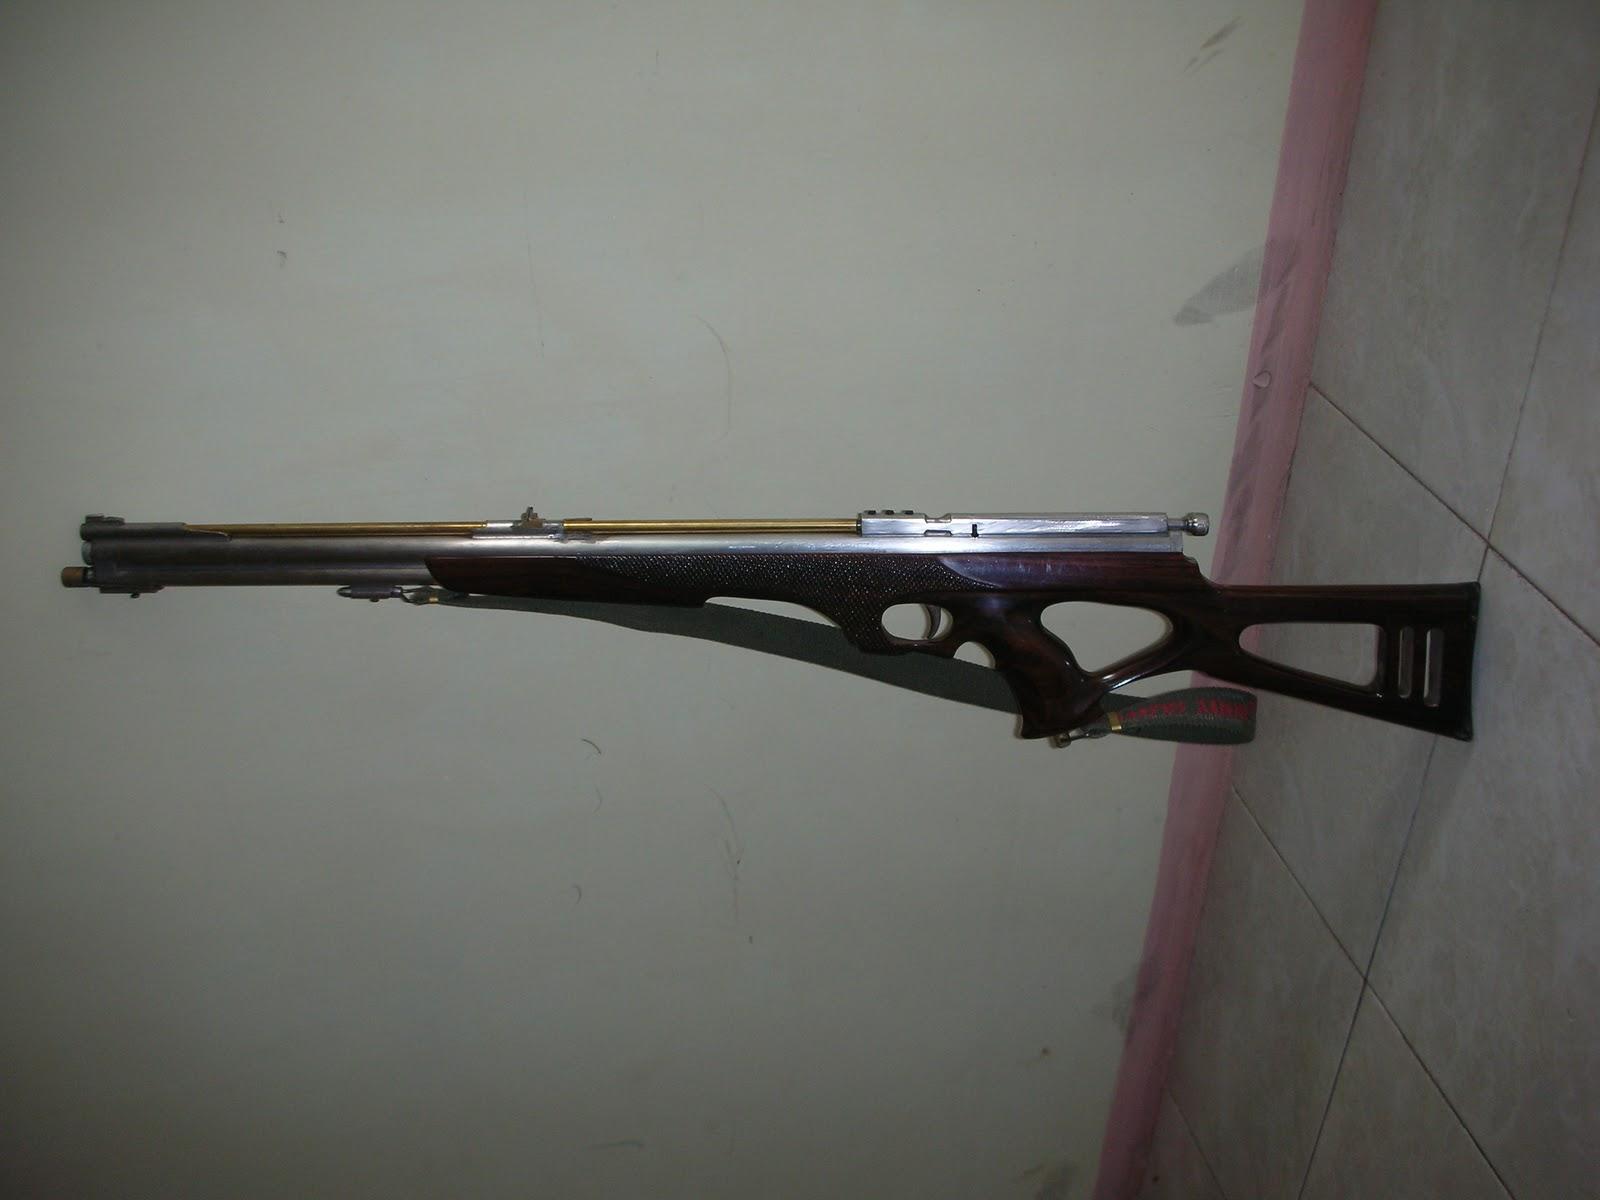 SENAPAN GEJLUK BLITAR: senapan angin gejluk laras panjang